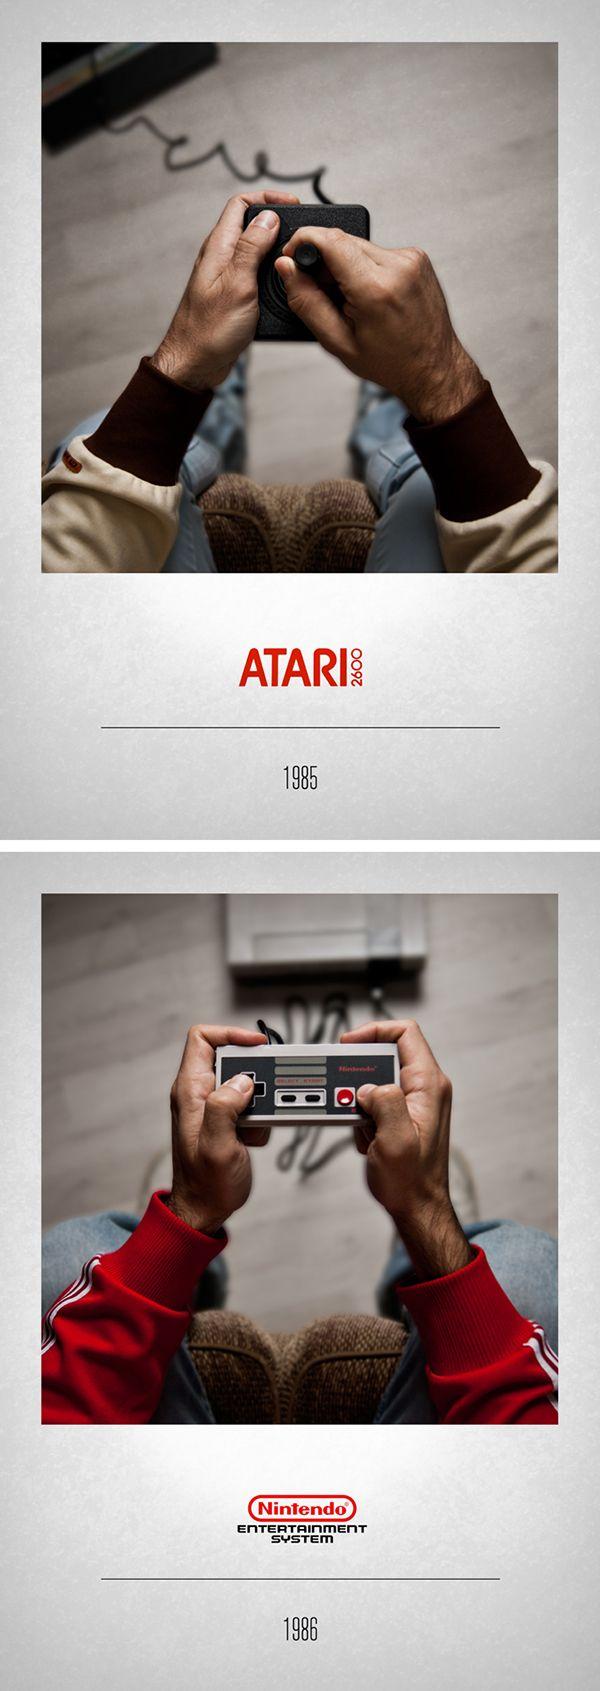 Ensaio fotográfico retrata a história dos controles de video game ao longo de 30 anos  –   VIP